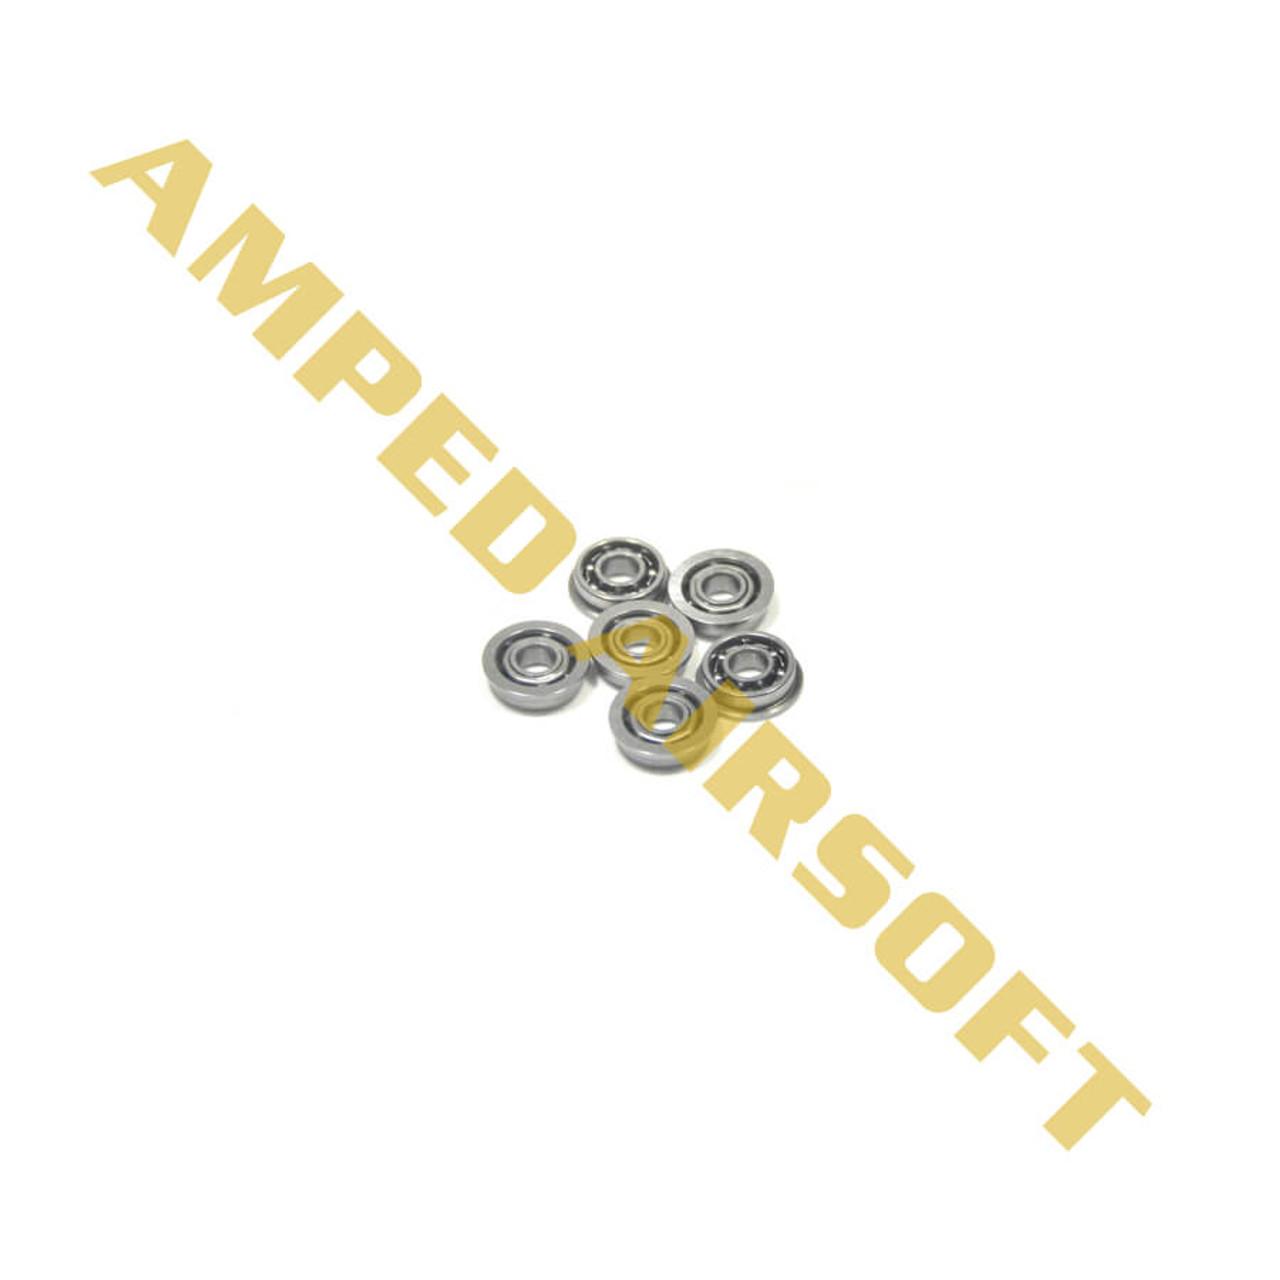 RETRO Arms - Ball Bearing Bushings (8mm)